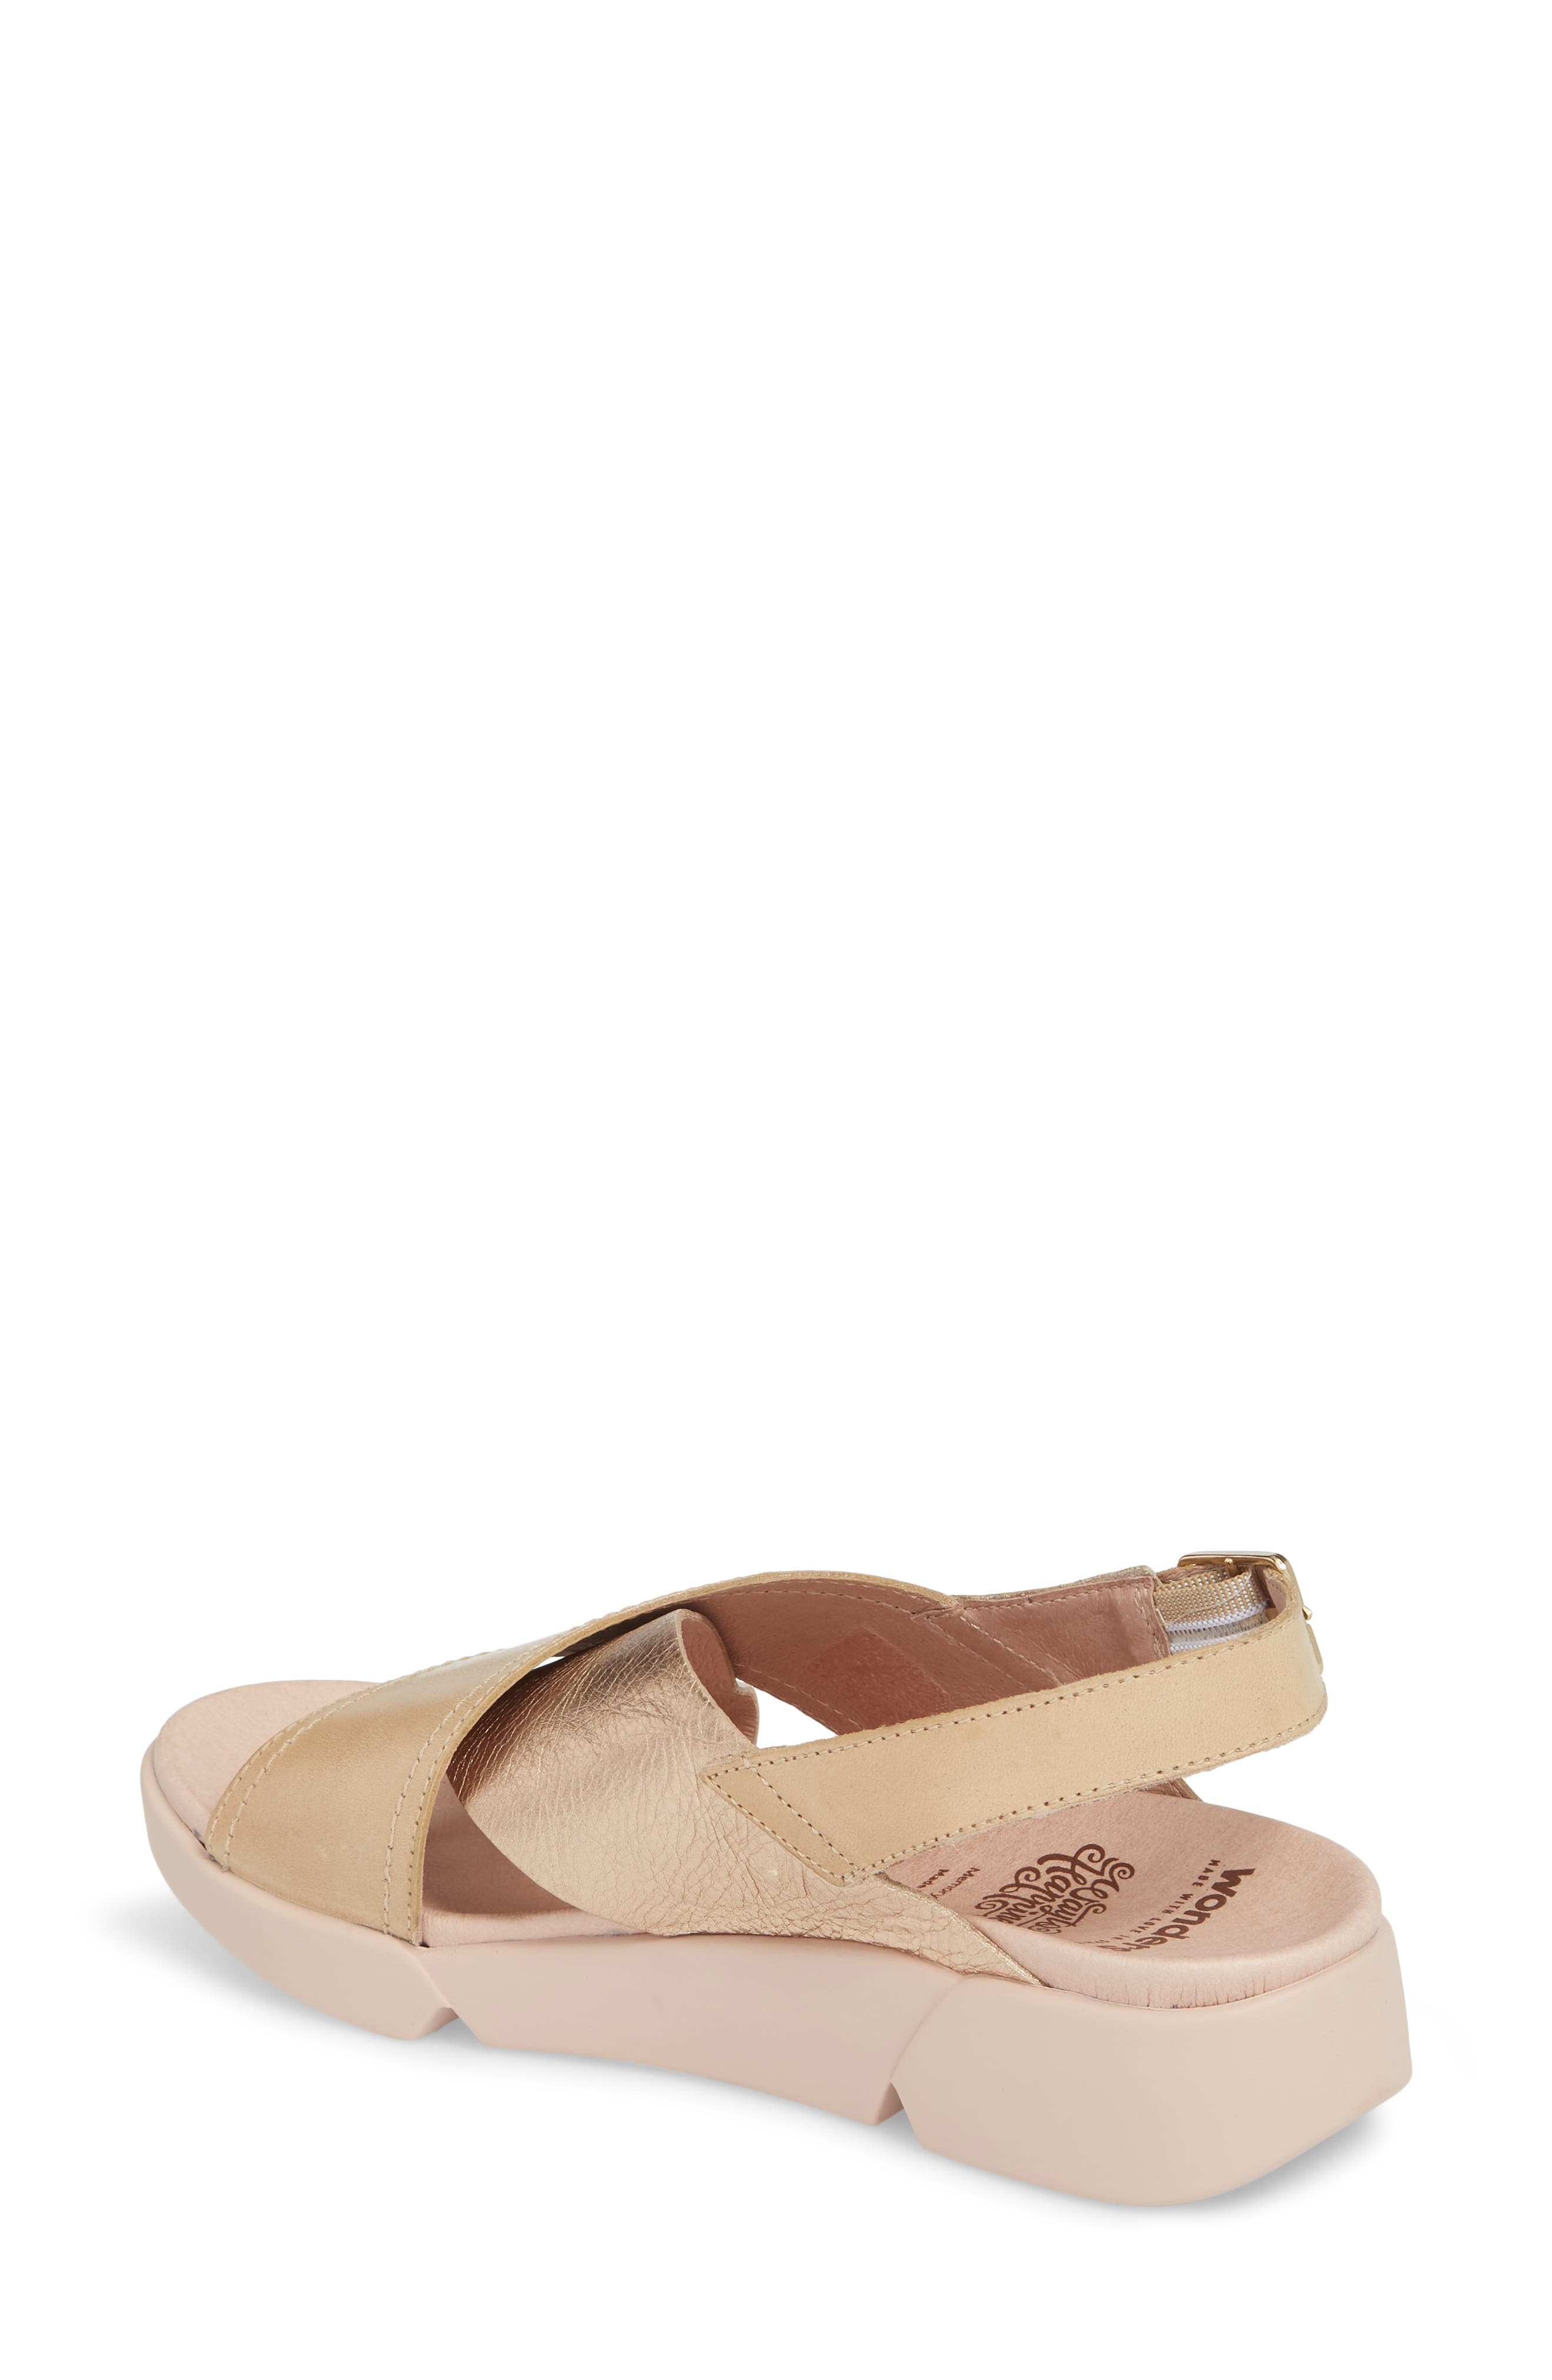 Platform Wedge Sandal,                             Alternate thumbnail 2, color,                             Oro/ Taupe Leather